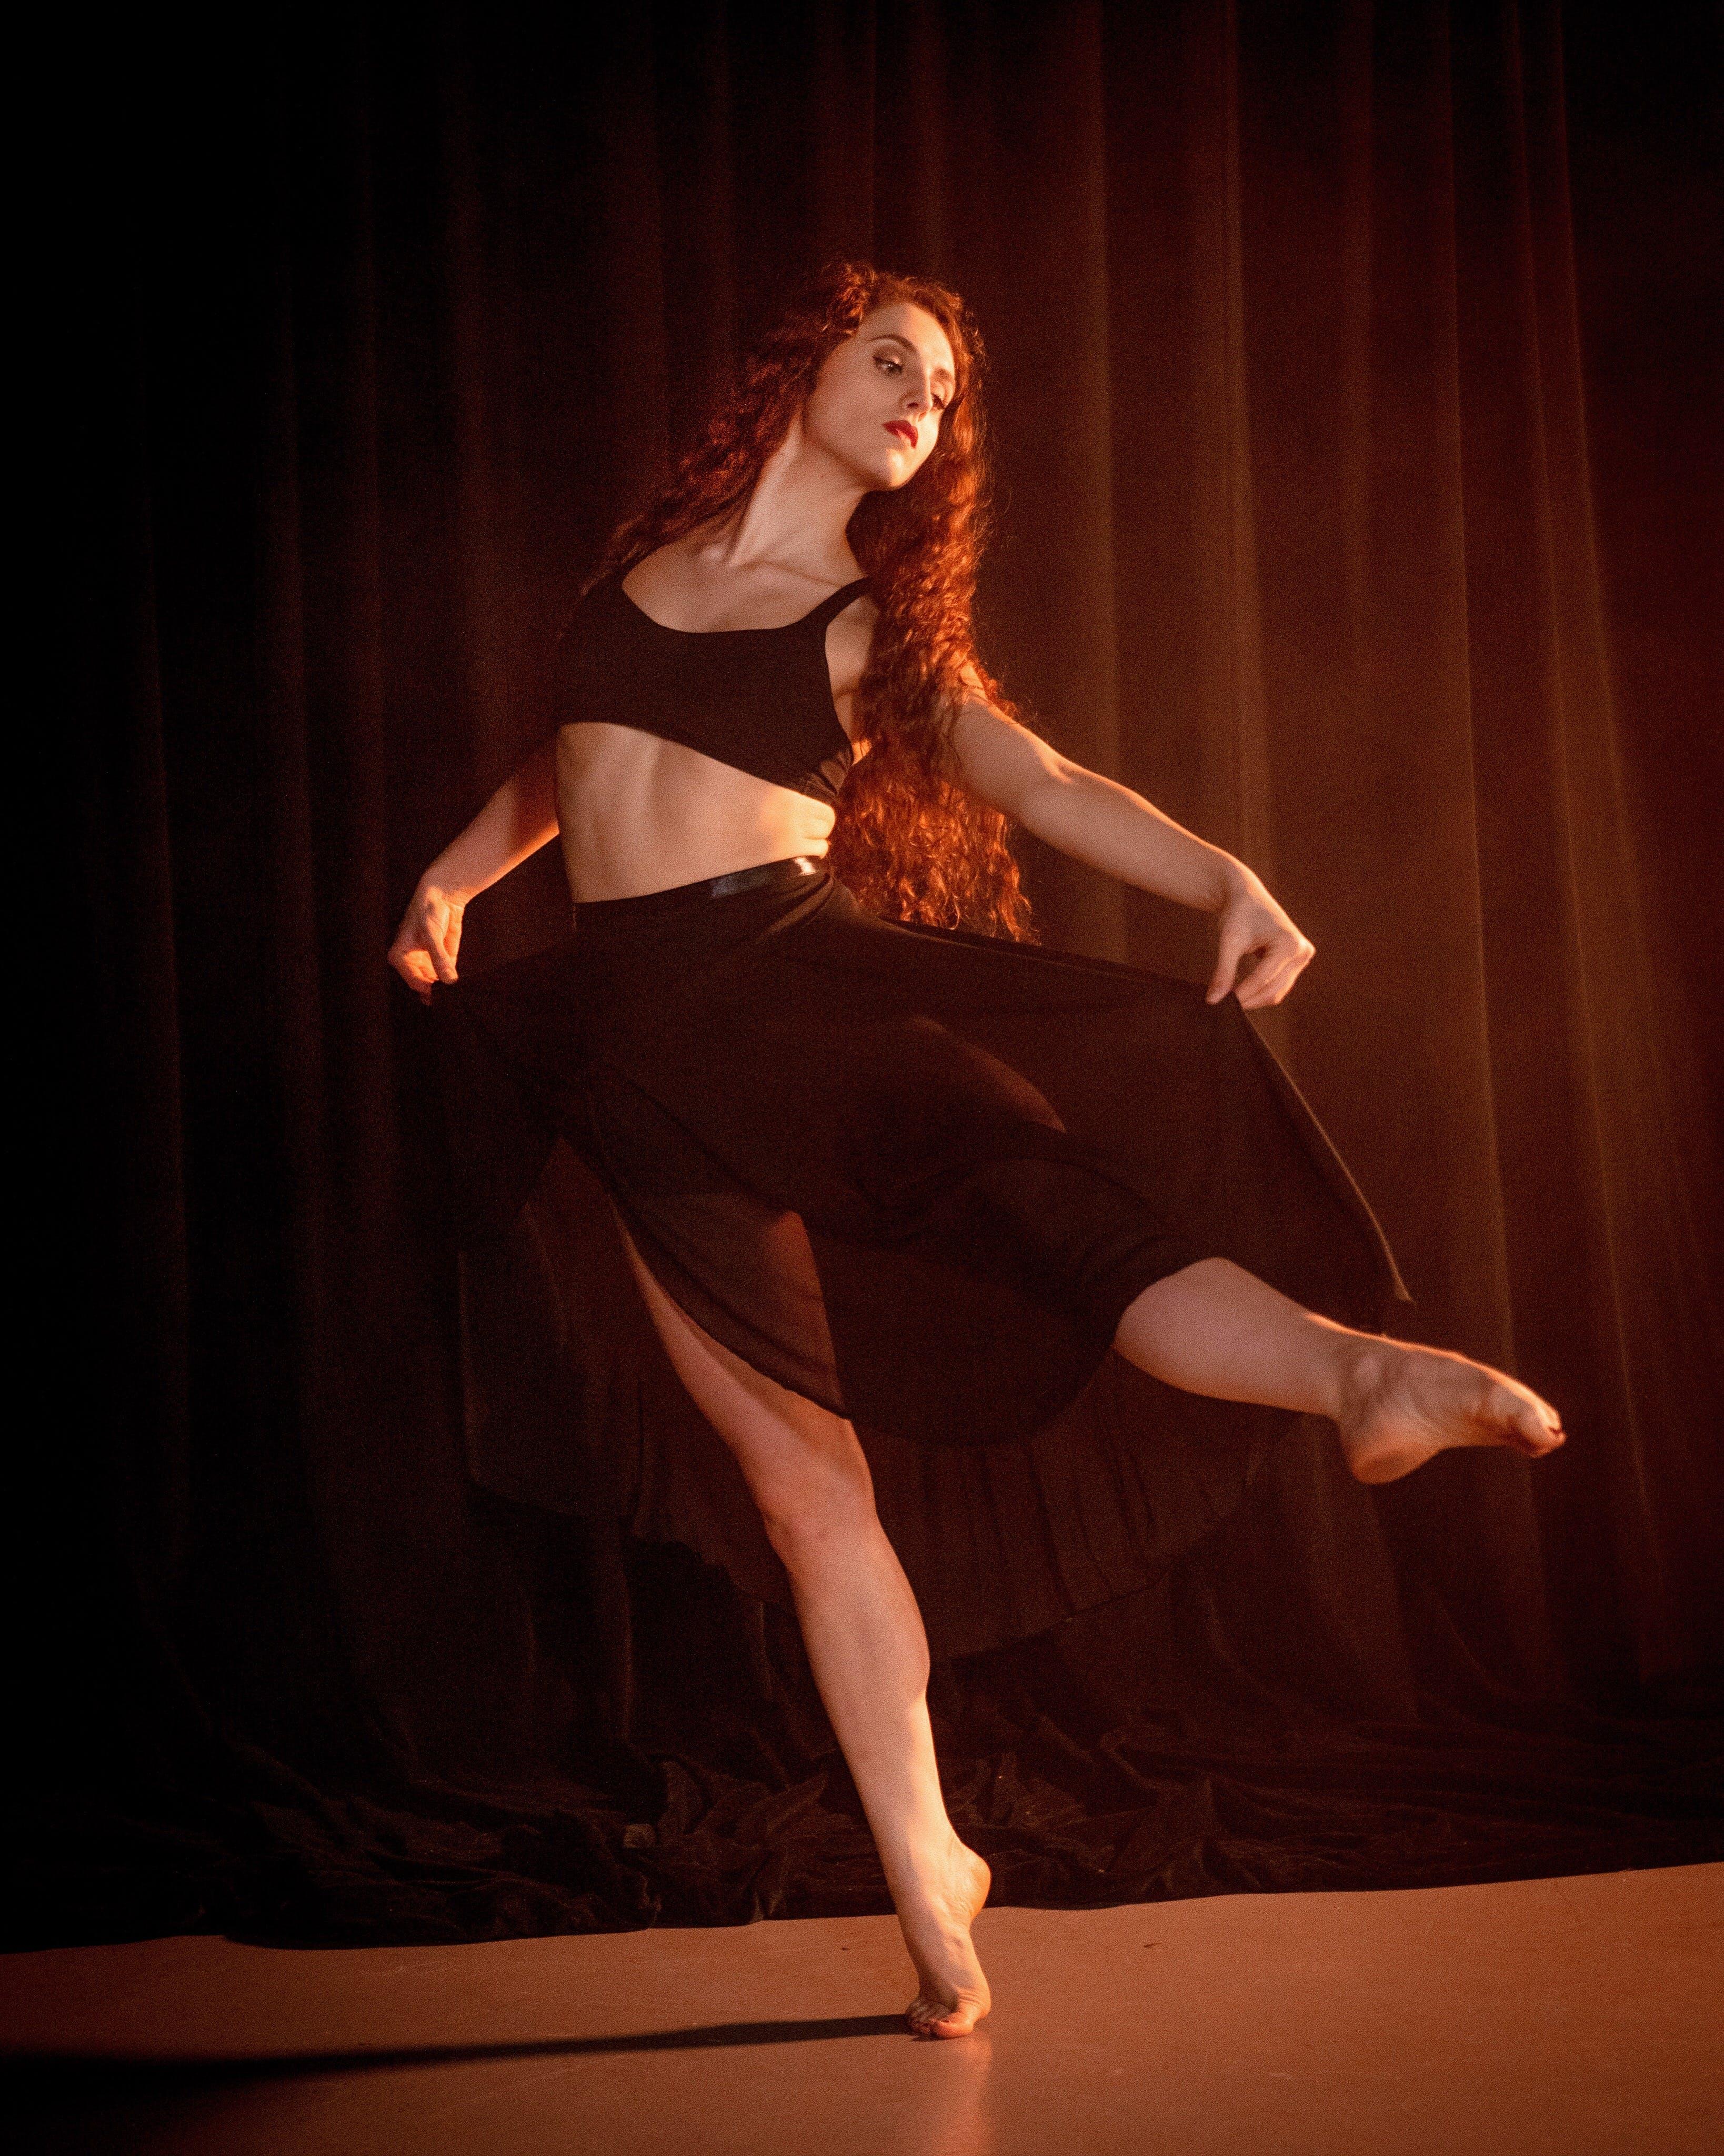 Gratis stockfoto met balans, ballerina, ballet, balletdanser